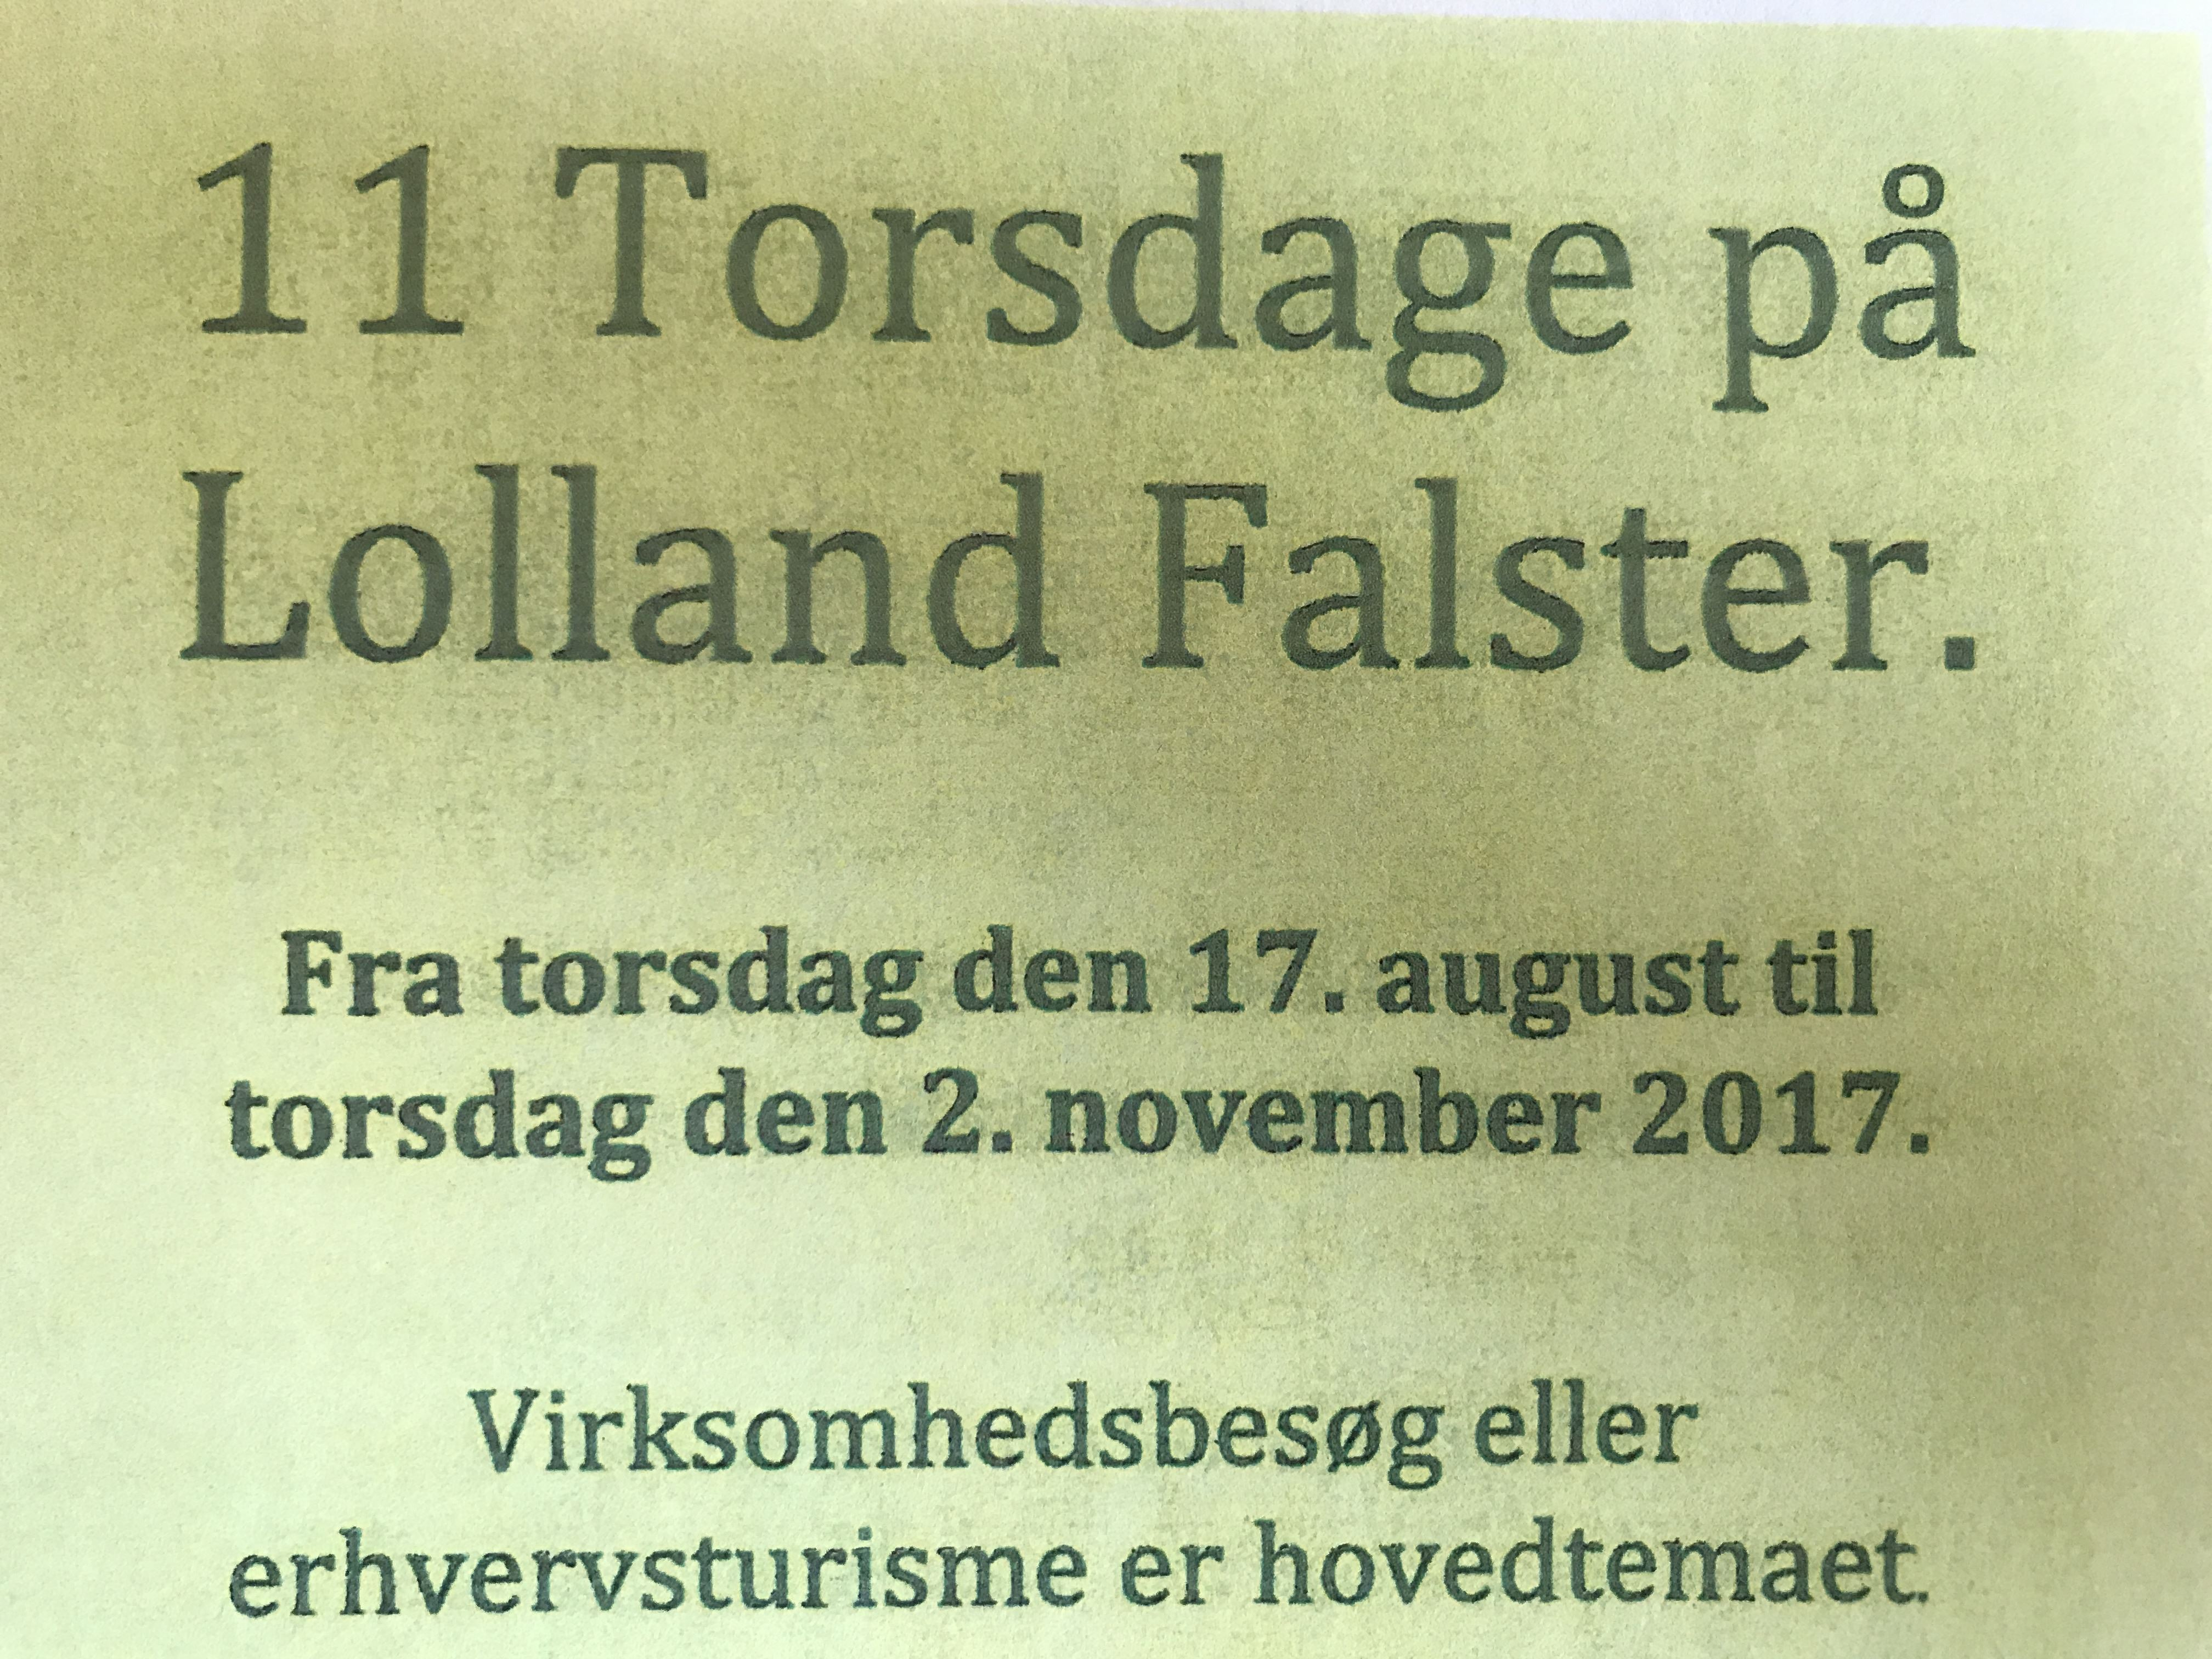 11 torsdage på Lolland Falster - Nakskov Mill Food